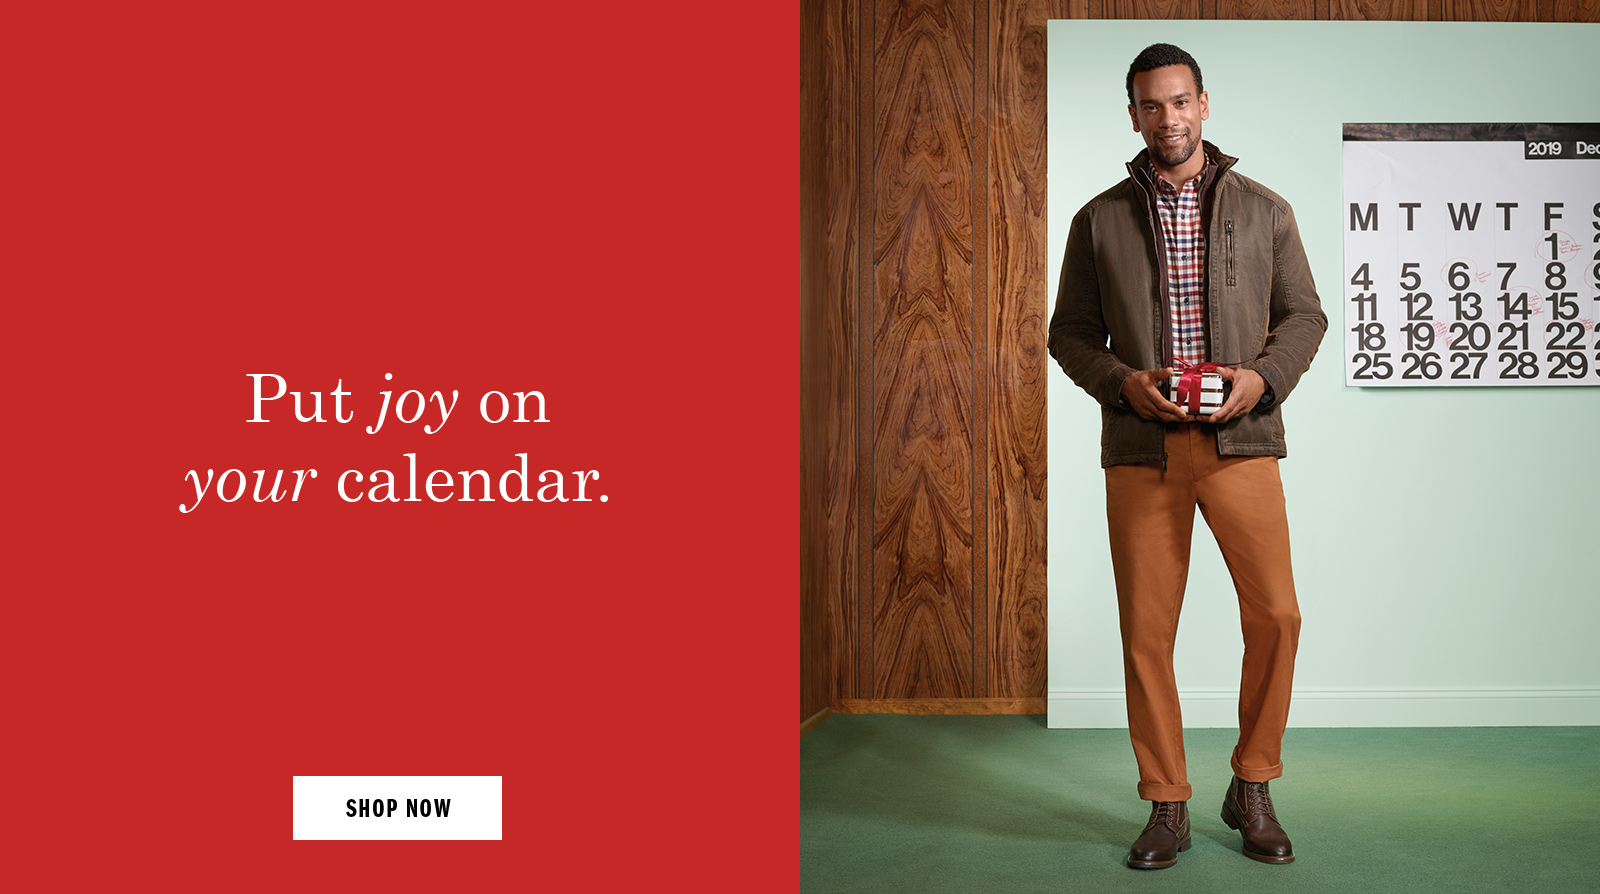 Put joy on your calendar - Shop Men's Boots and Apparel